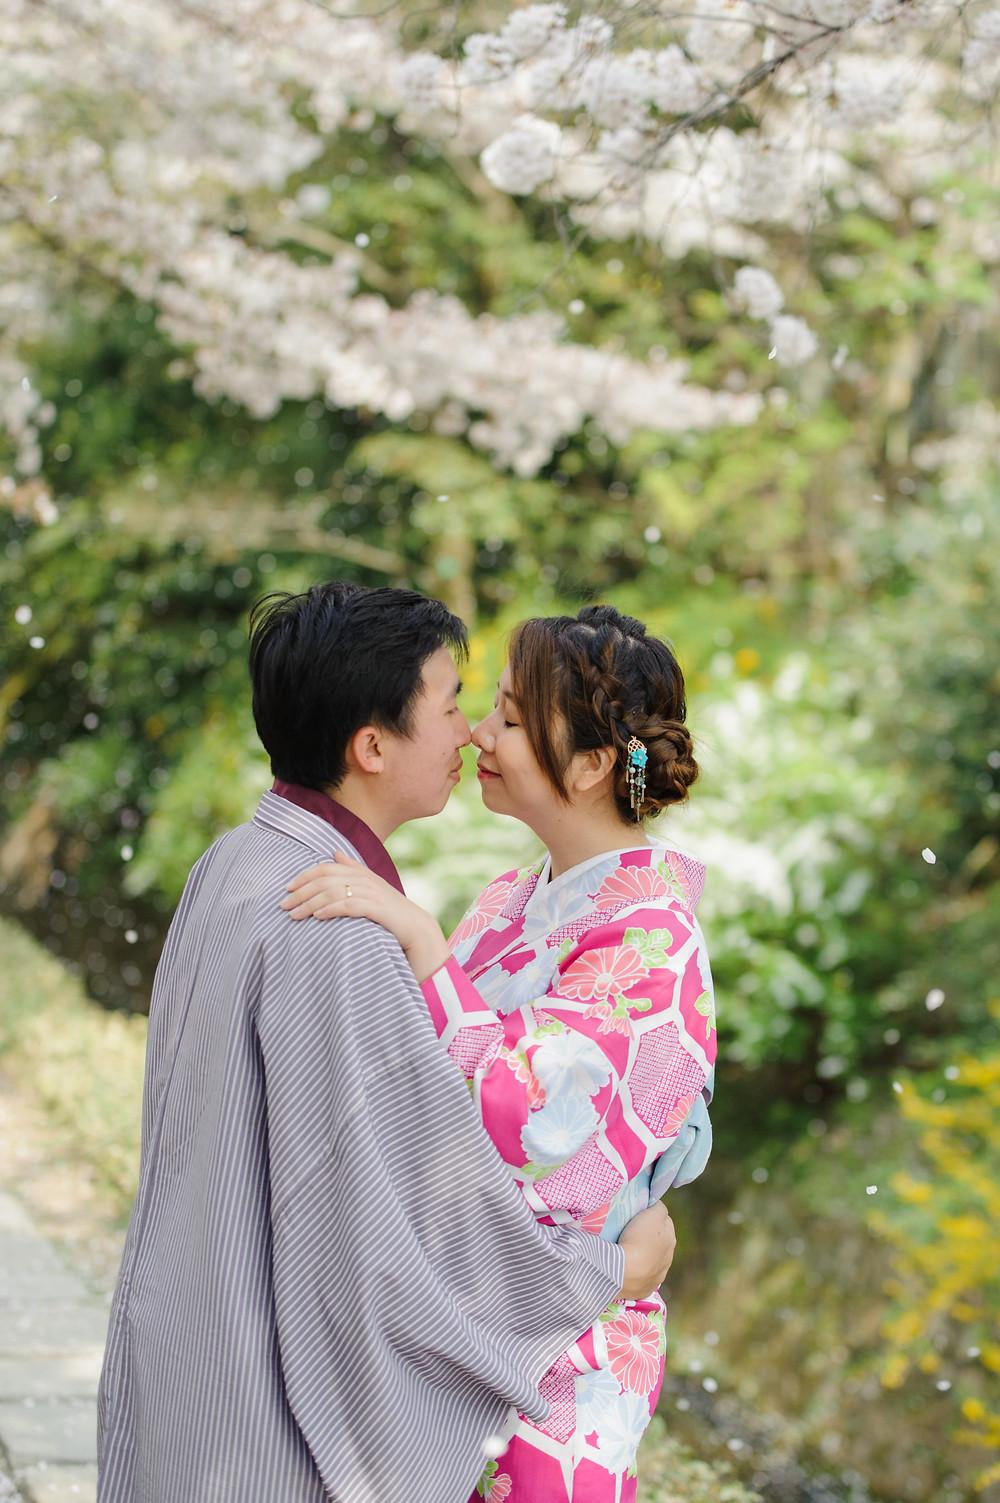 Sakura snow falling around the couple